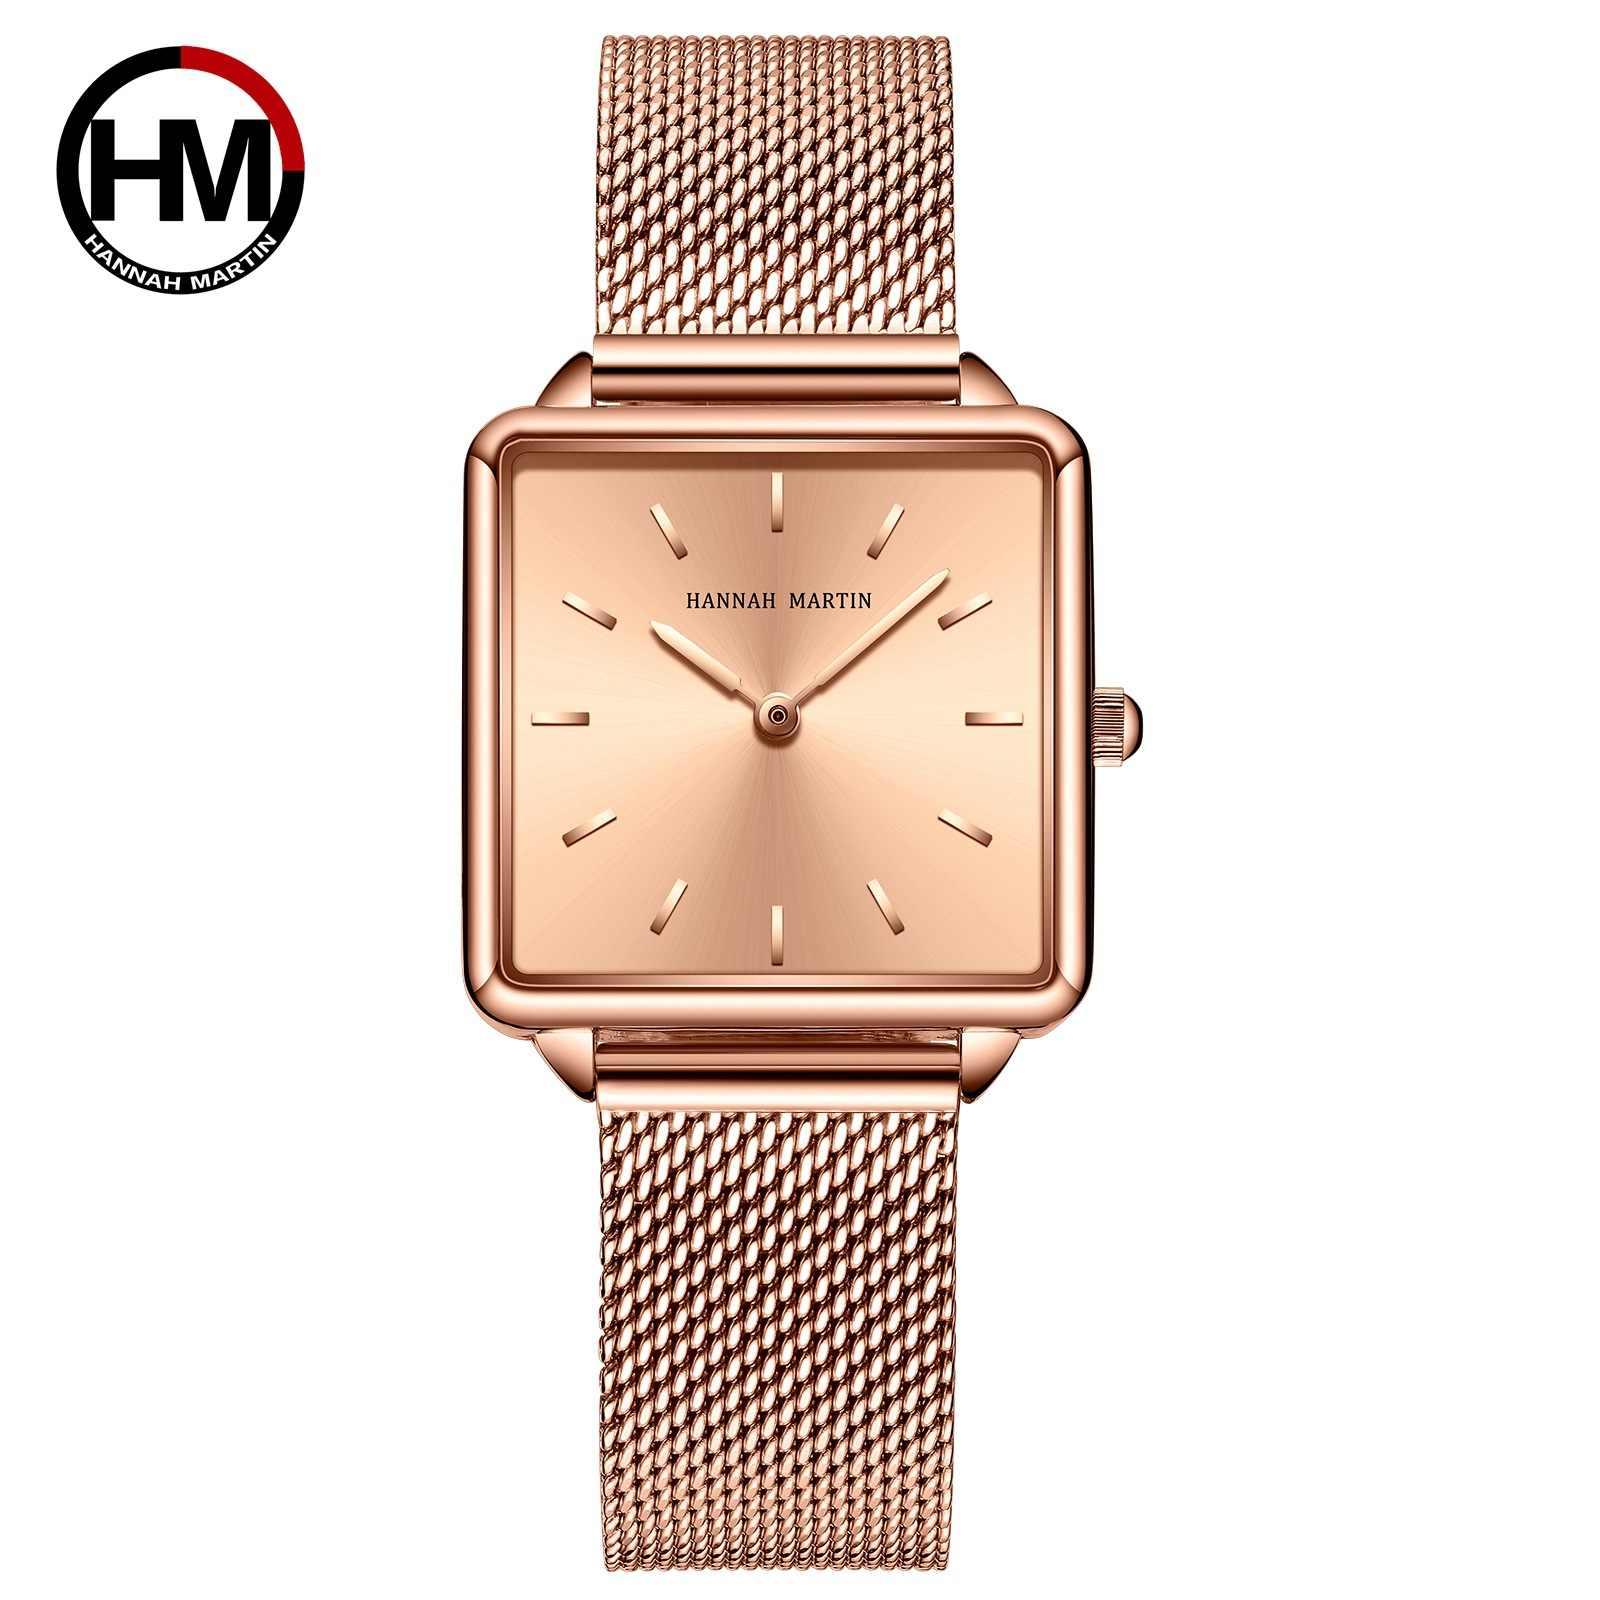 Hannah Martin ญี่ปุ่นผู้หญิง Rose Gold นาฬิกาแฟชั่น Casual นาฬิกาสุภาพสตรีสุภาพสตรีนาฬิกา Relogio Feminino